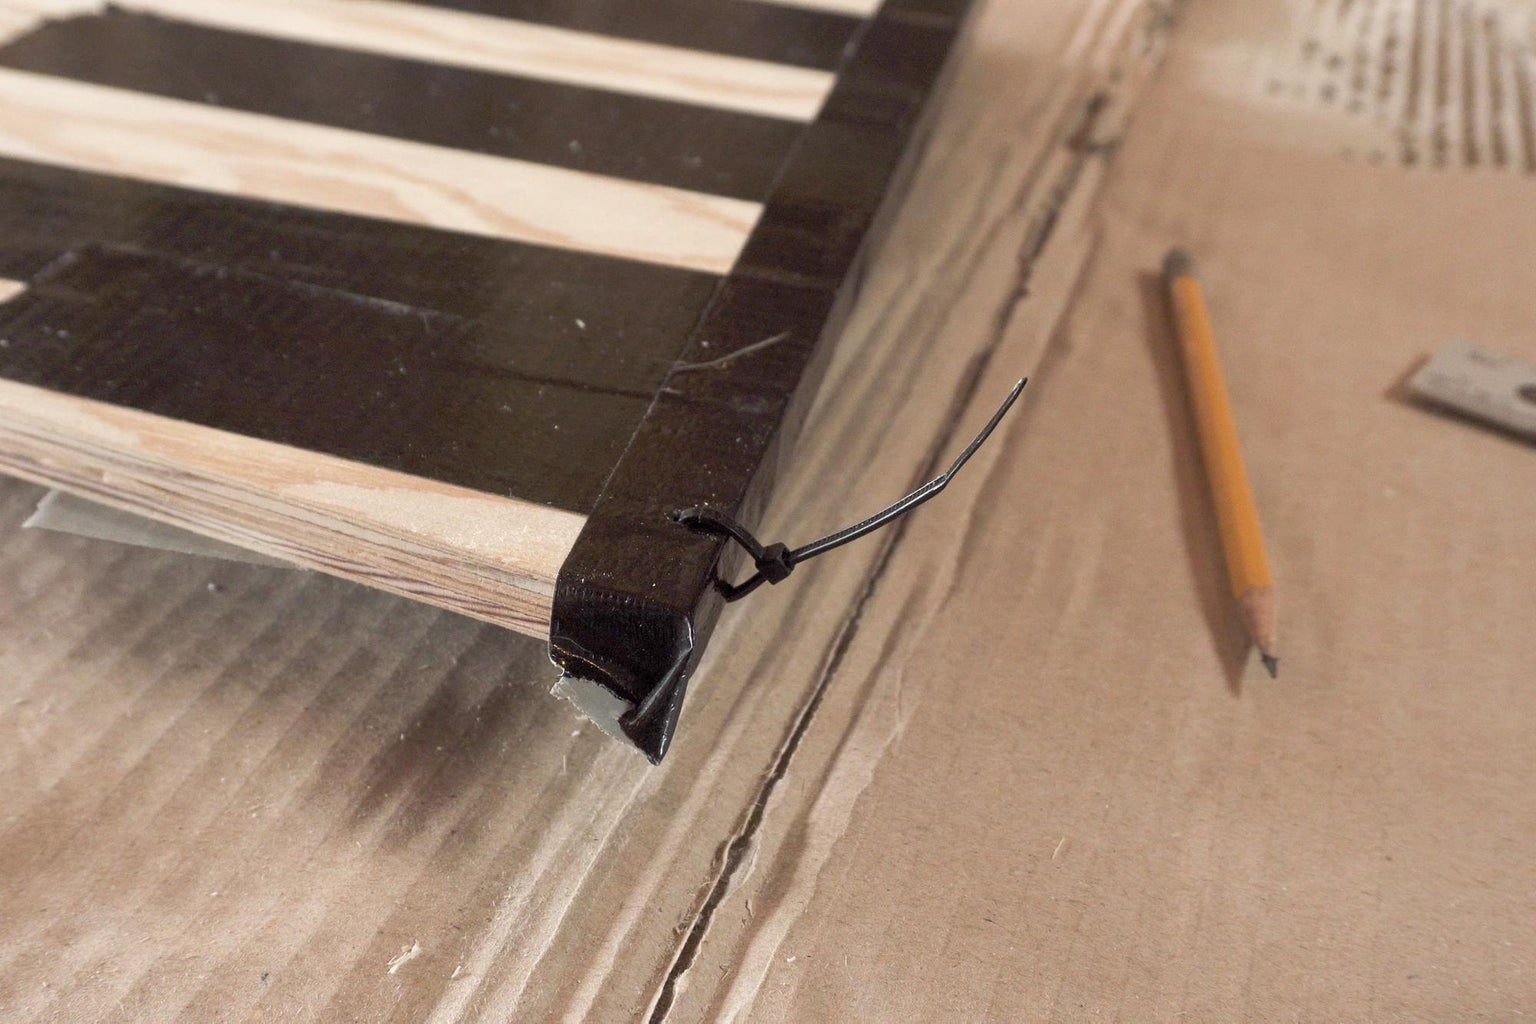 Zip Ties and Duct Tape